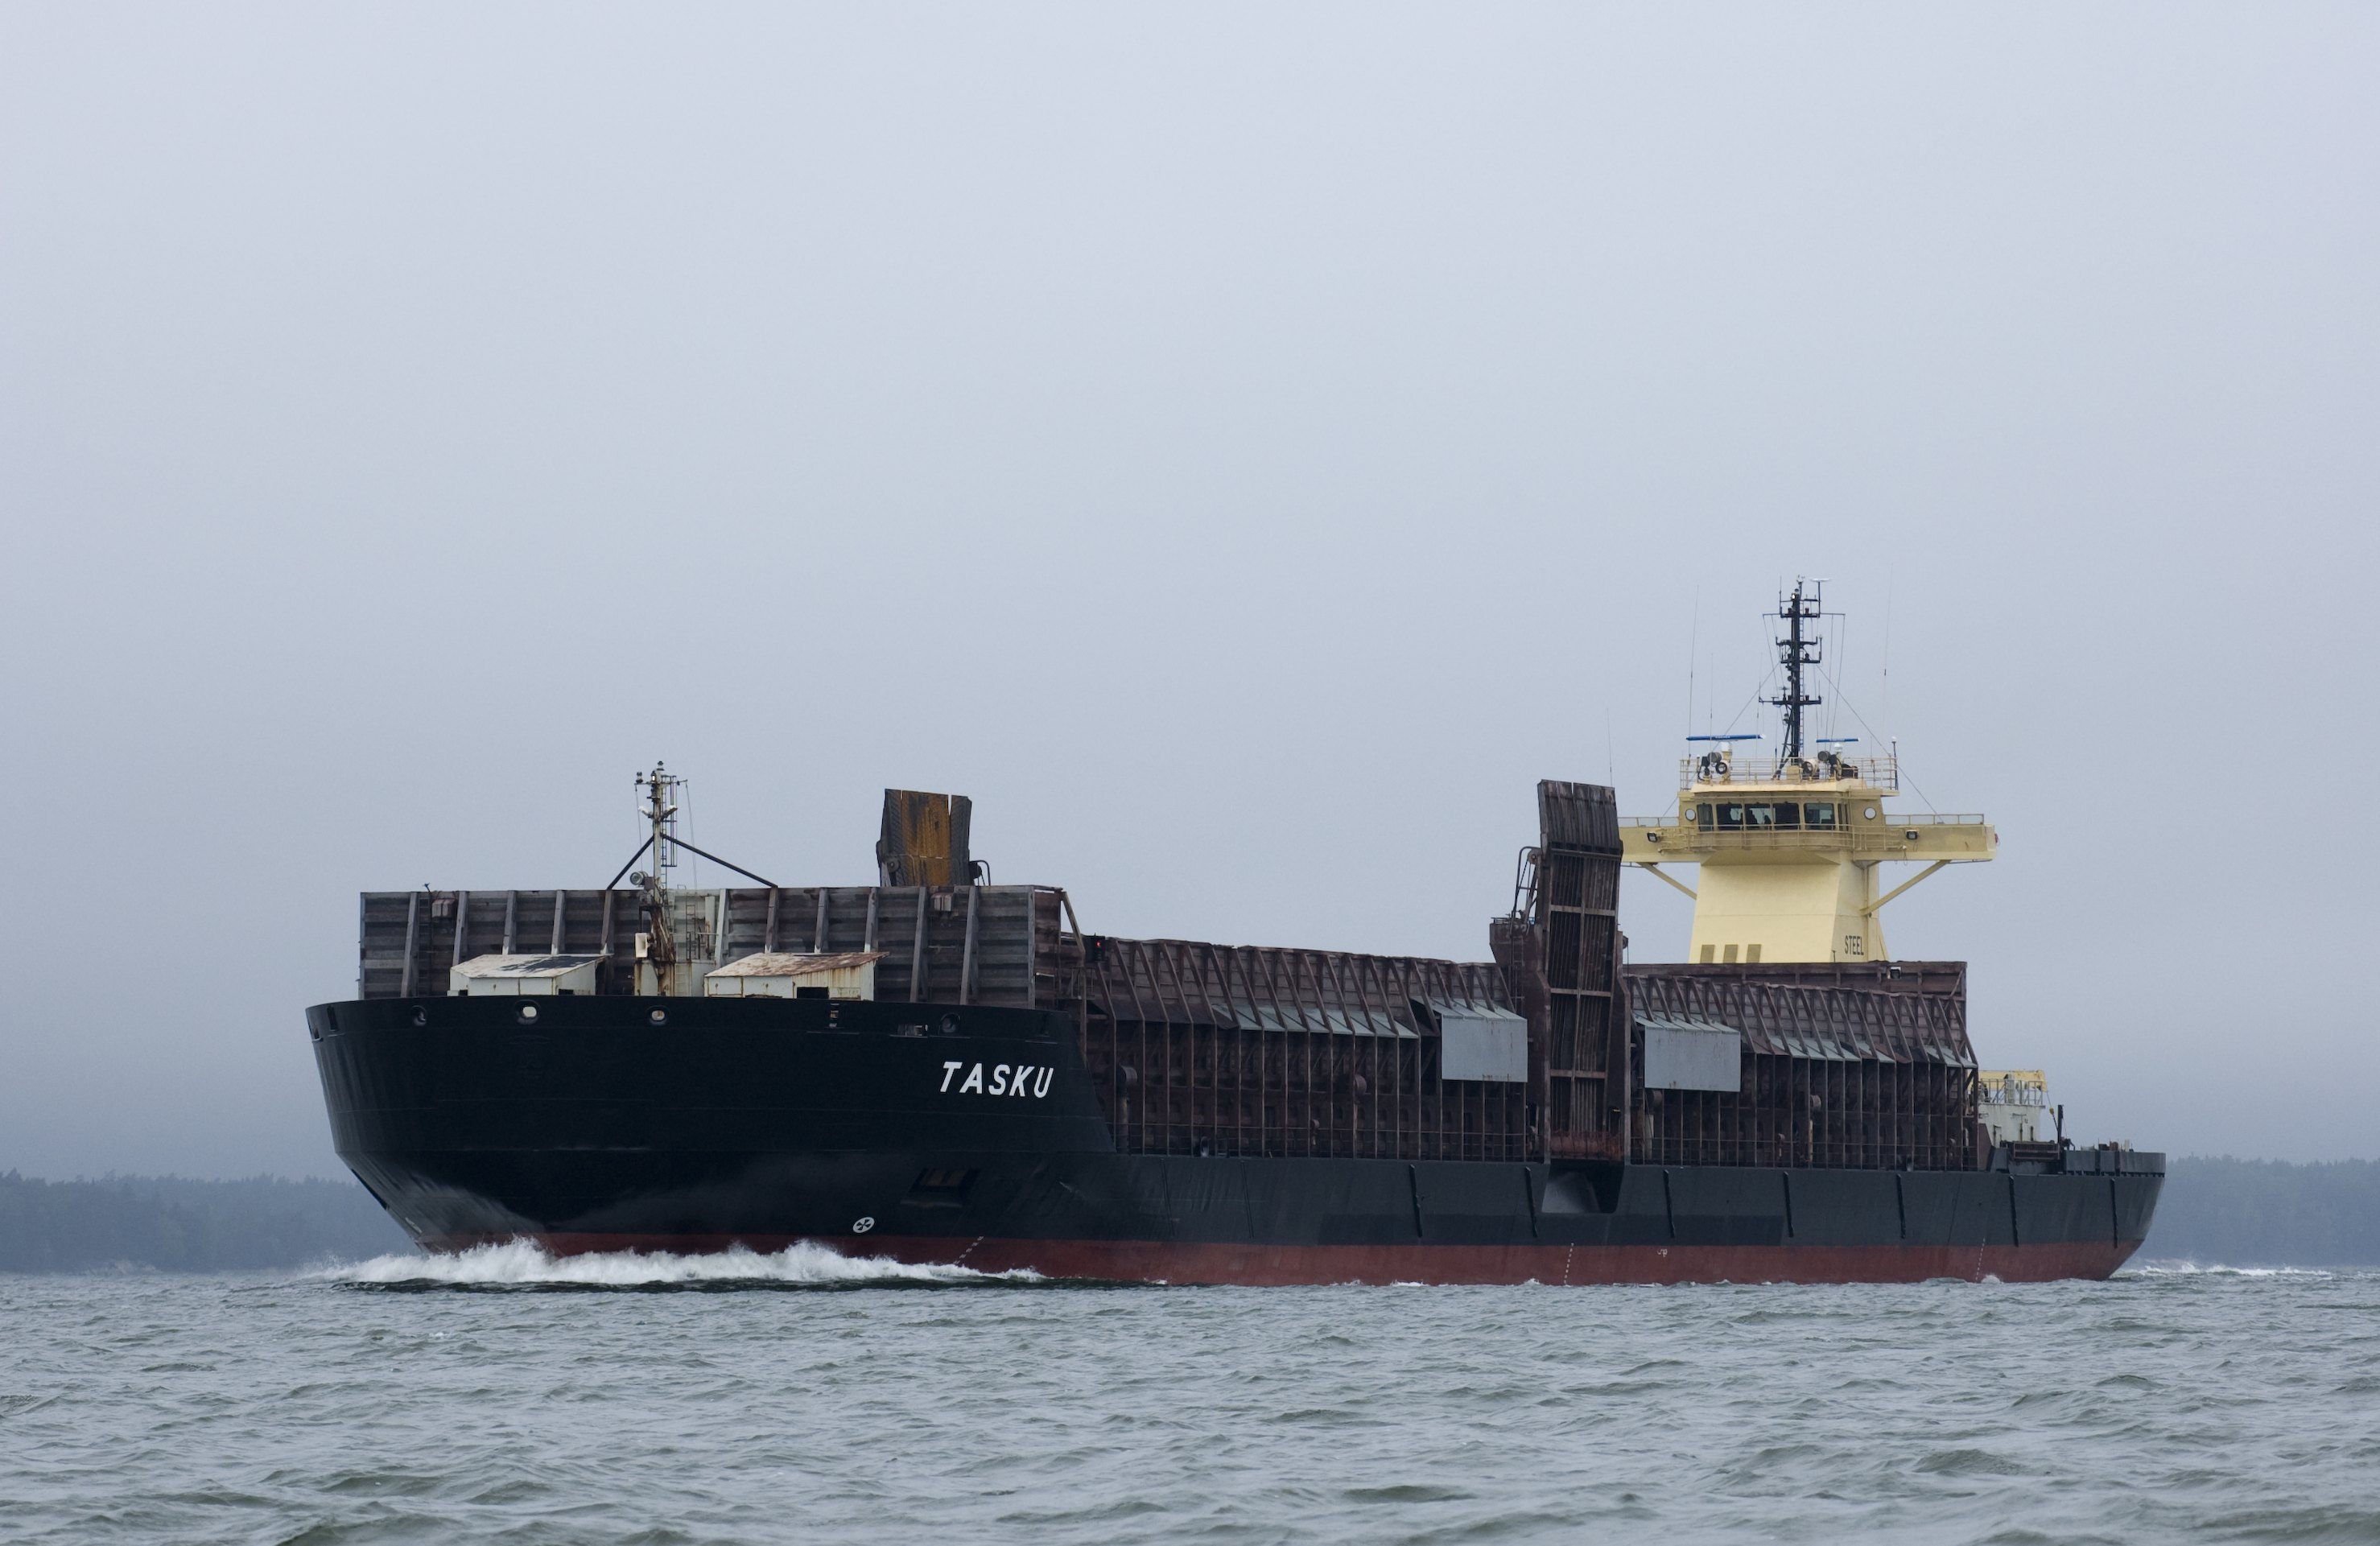 Barge Tasku